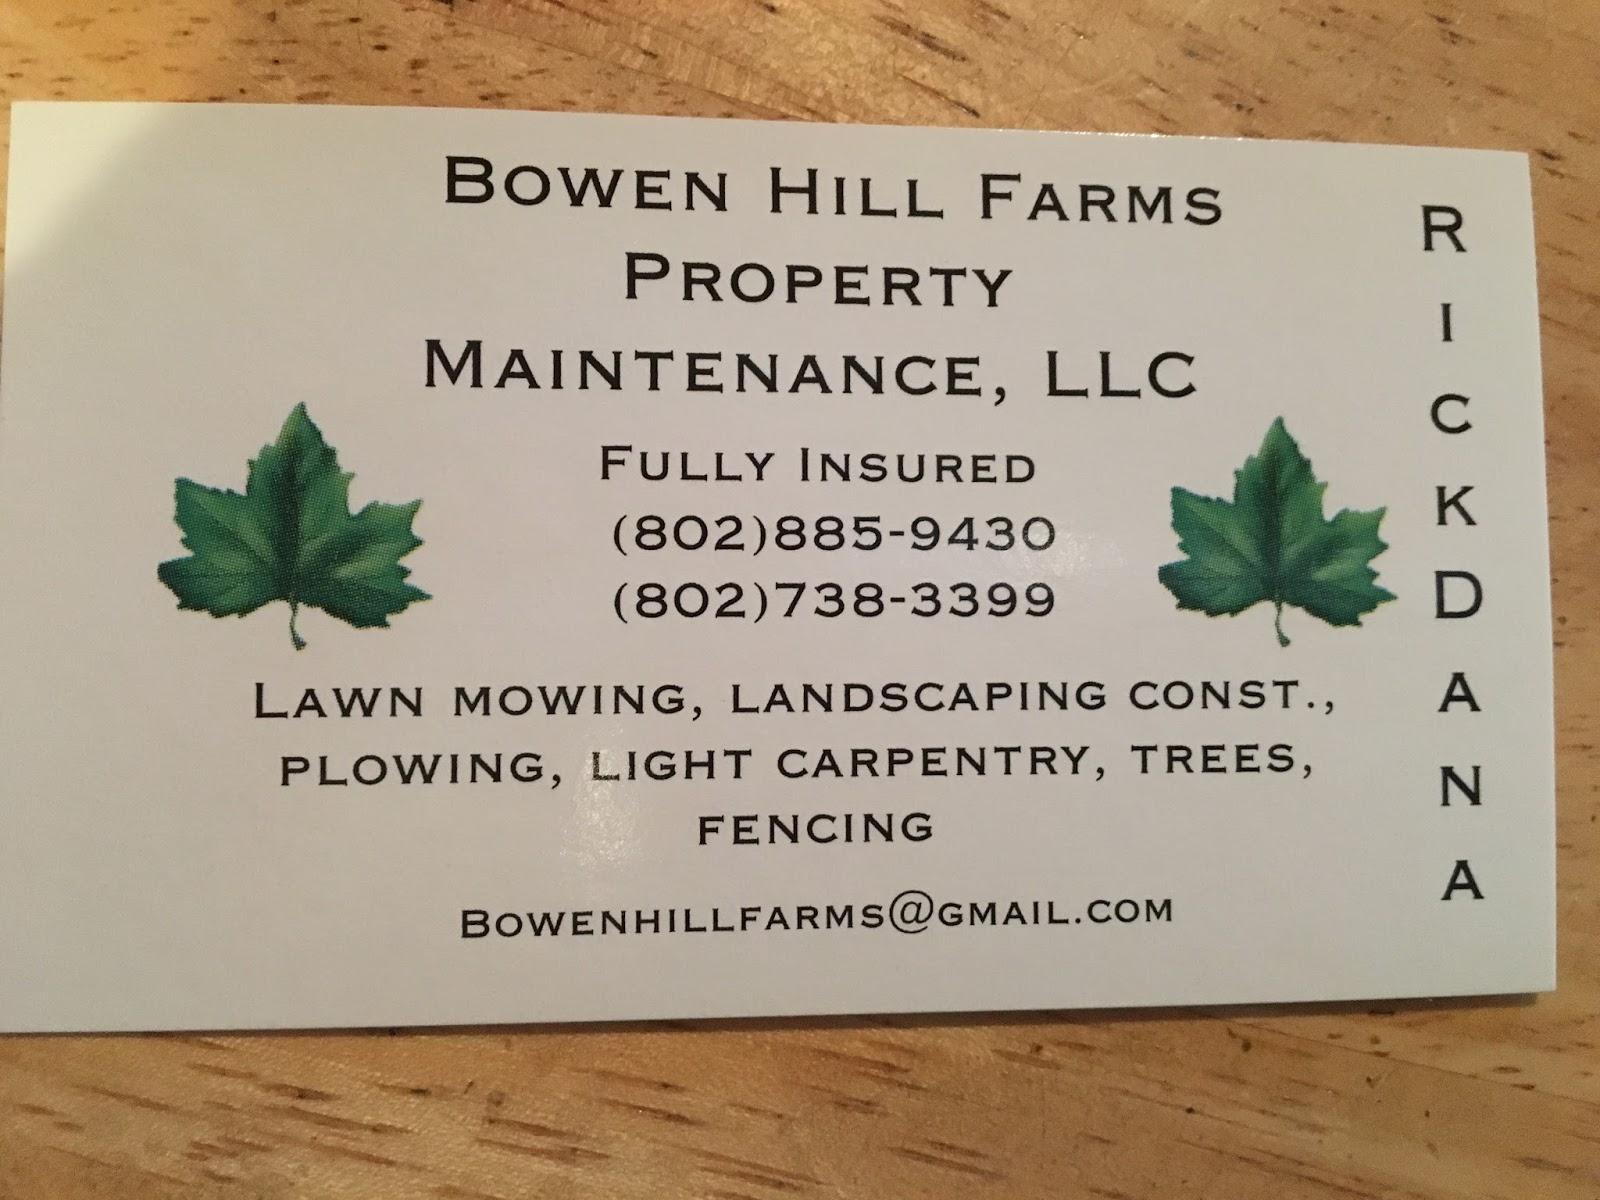 Flower Farm Business Cards | Gardening: Flower and Vegetables